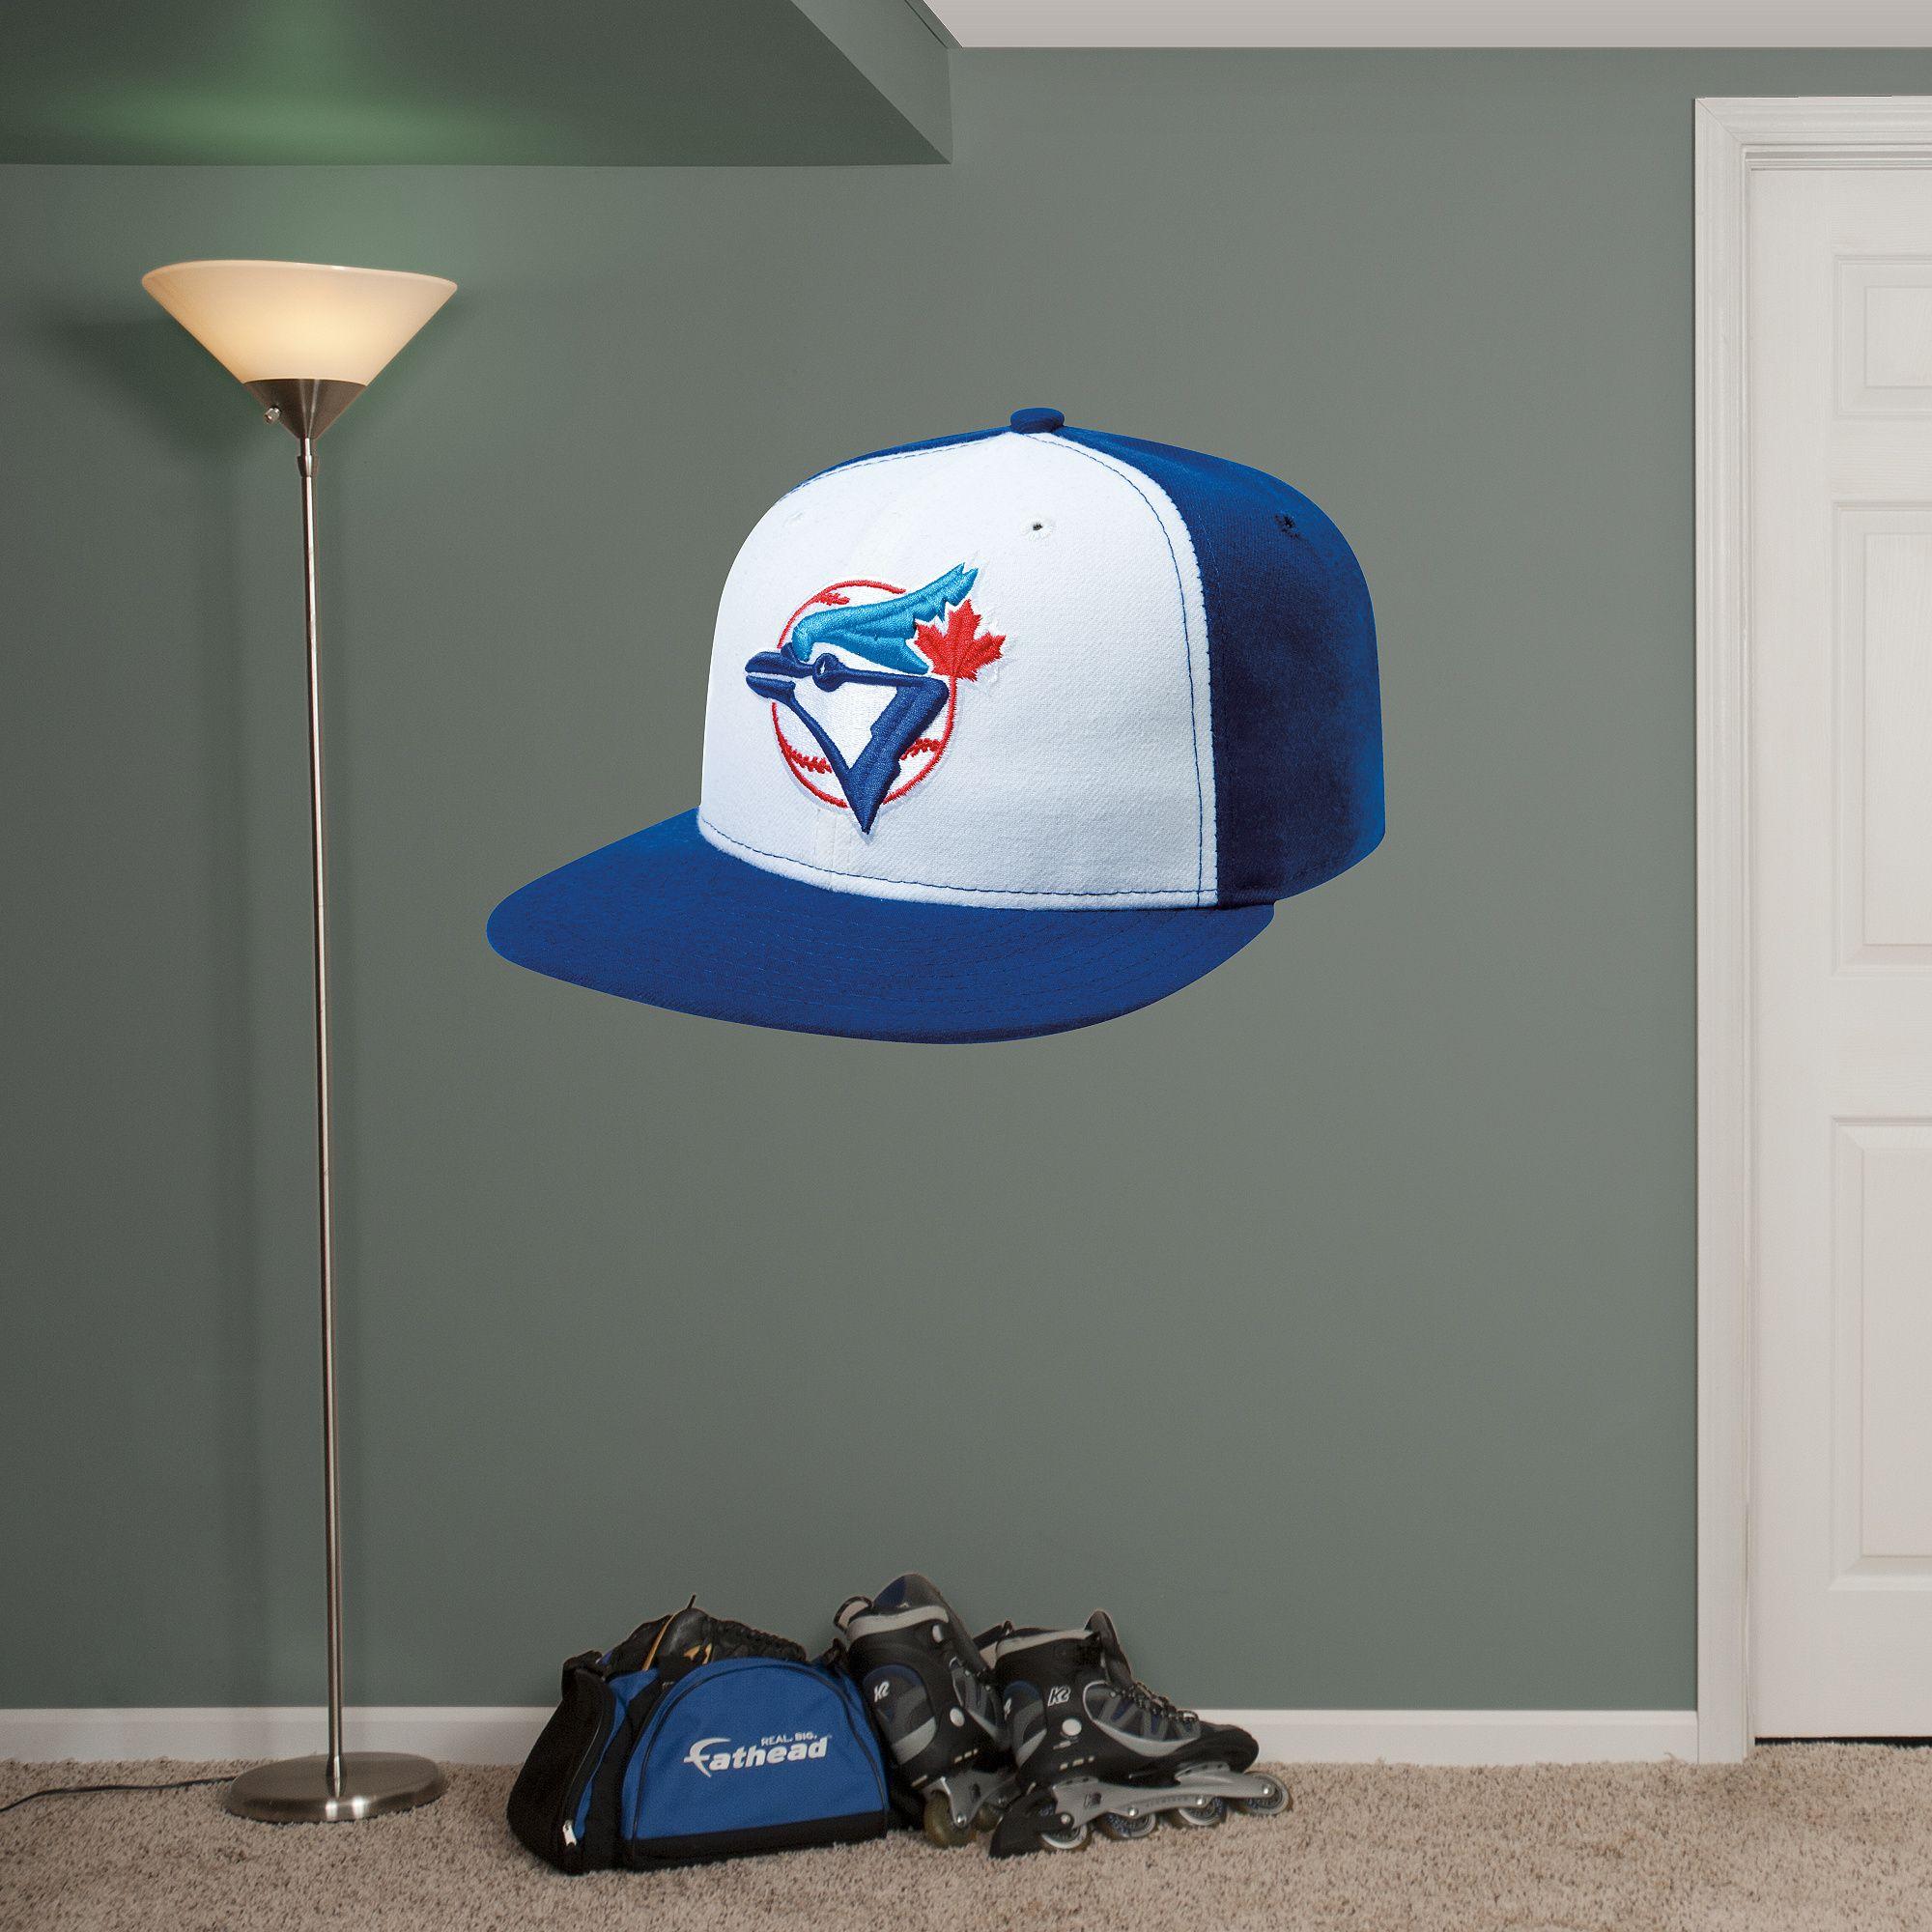 Toronto Blue Jays Alternate Cap REAL.BIG. Fathead Wall Graphic | Toronto Blue Jays Wall Decal | Sports Decor | Baseball Bedroom/Man Cave/Nursery & Toronto Blue Jays Alternate Cap REAL.BIG. Fathead Wall Graphic ...